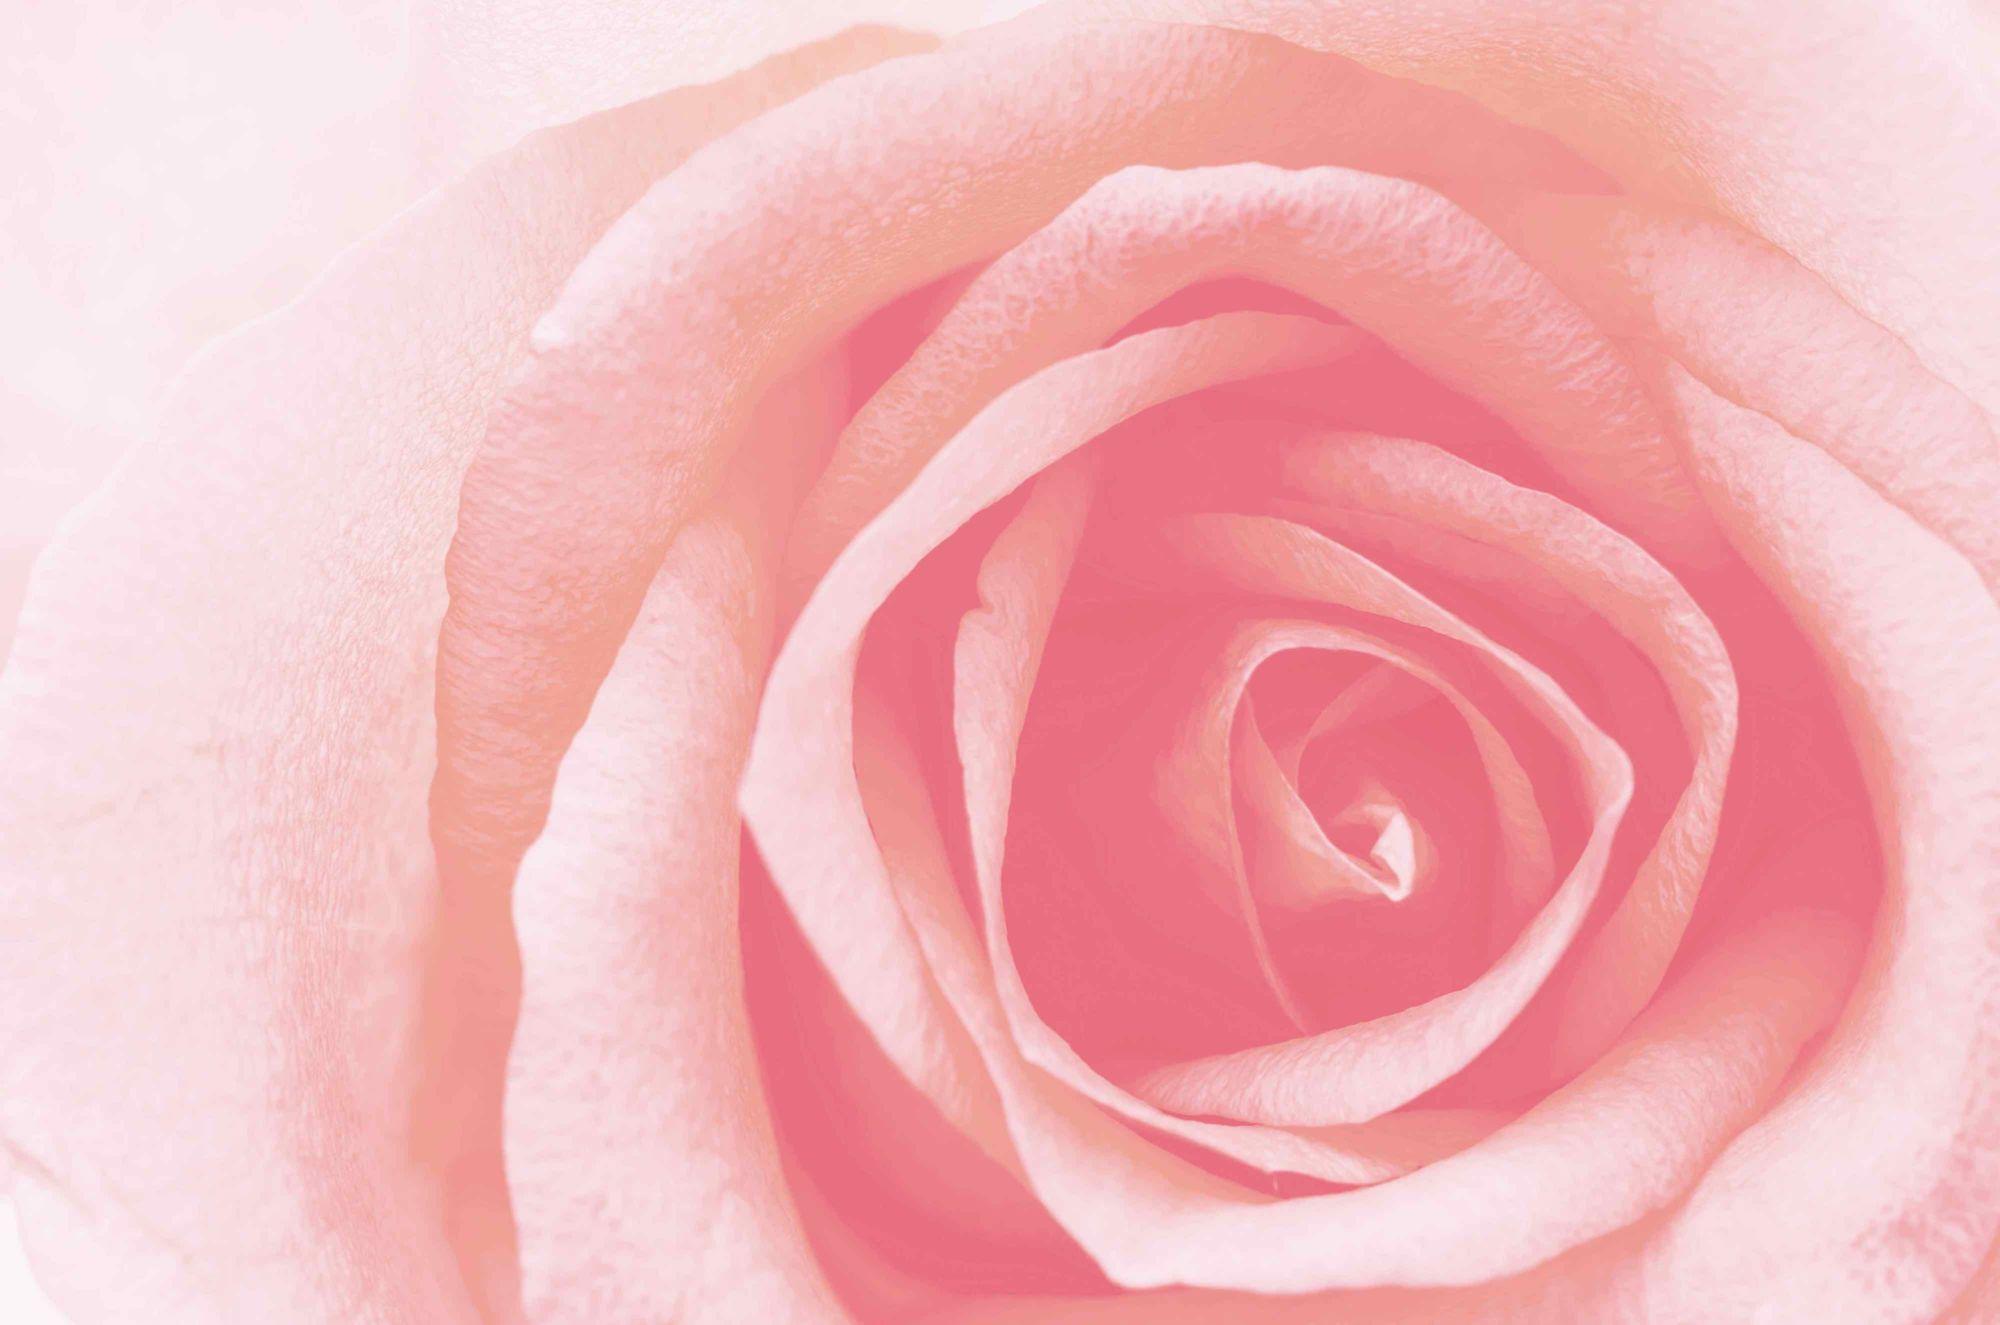 růžová altearah bio